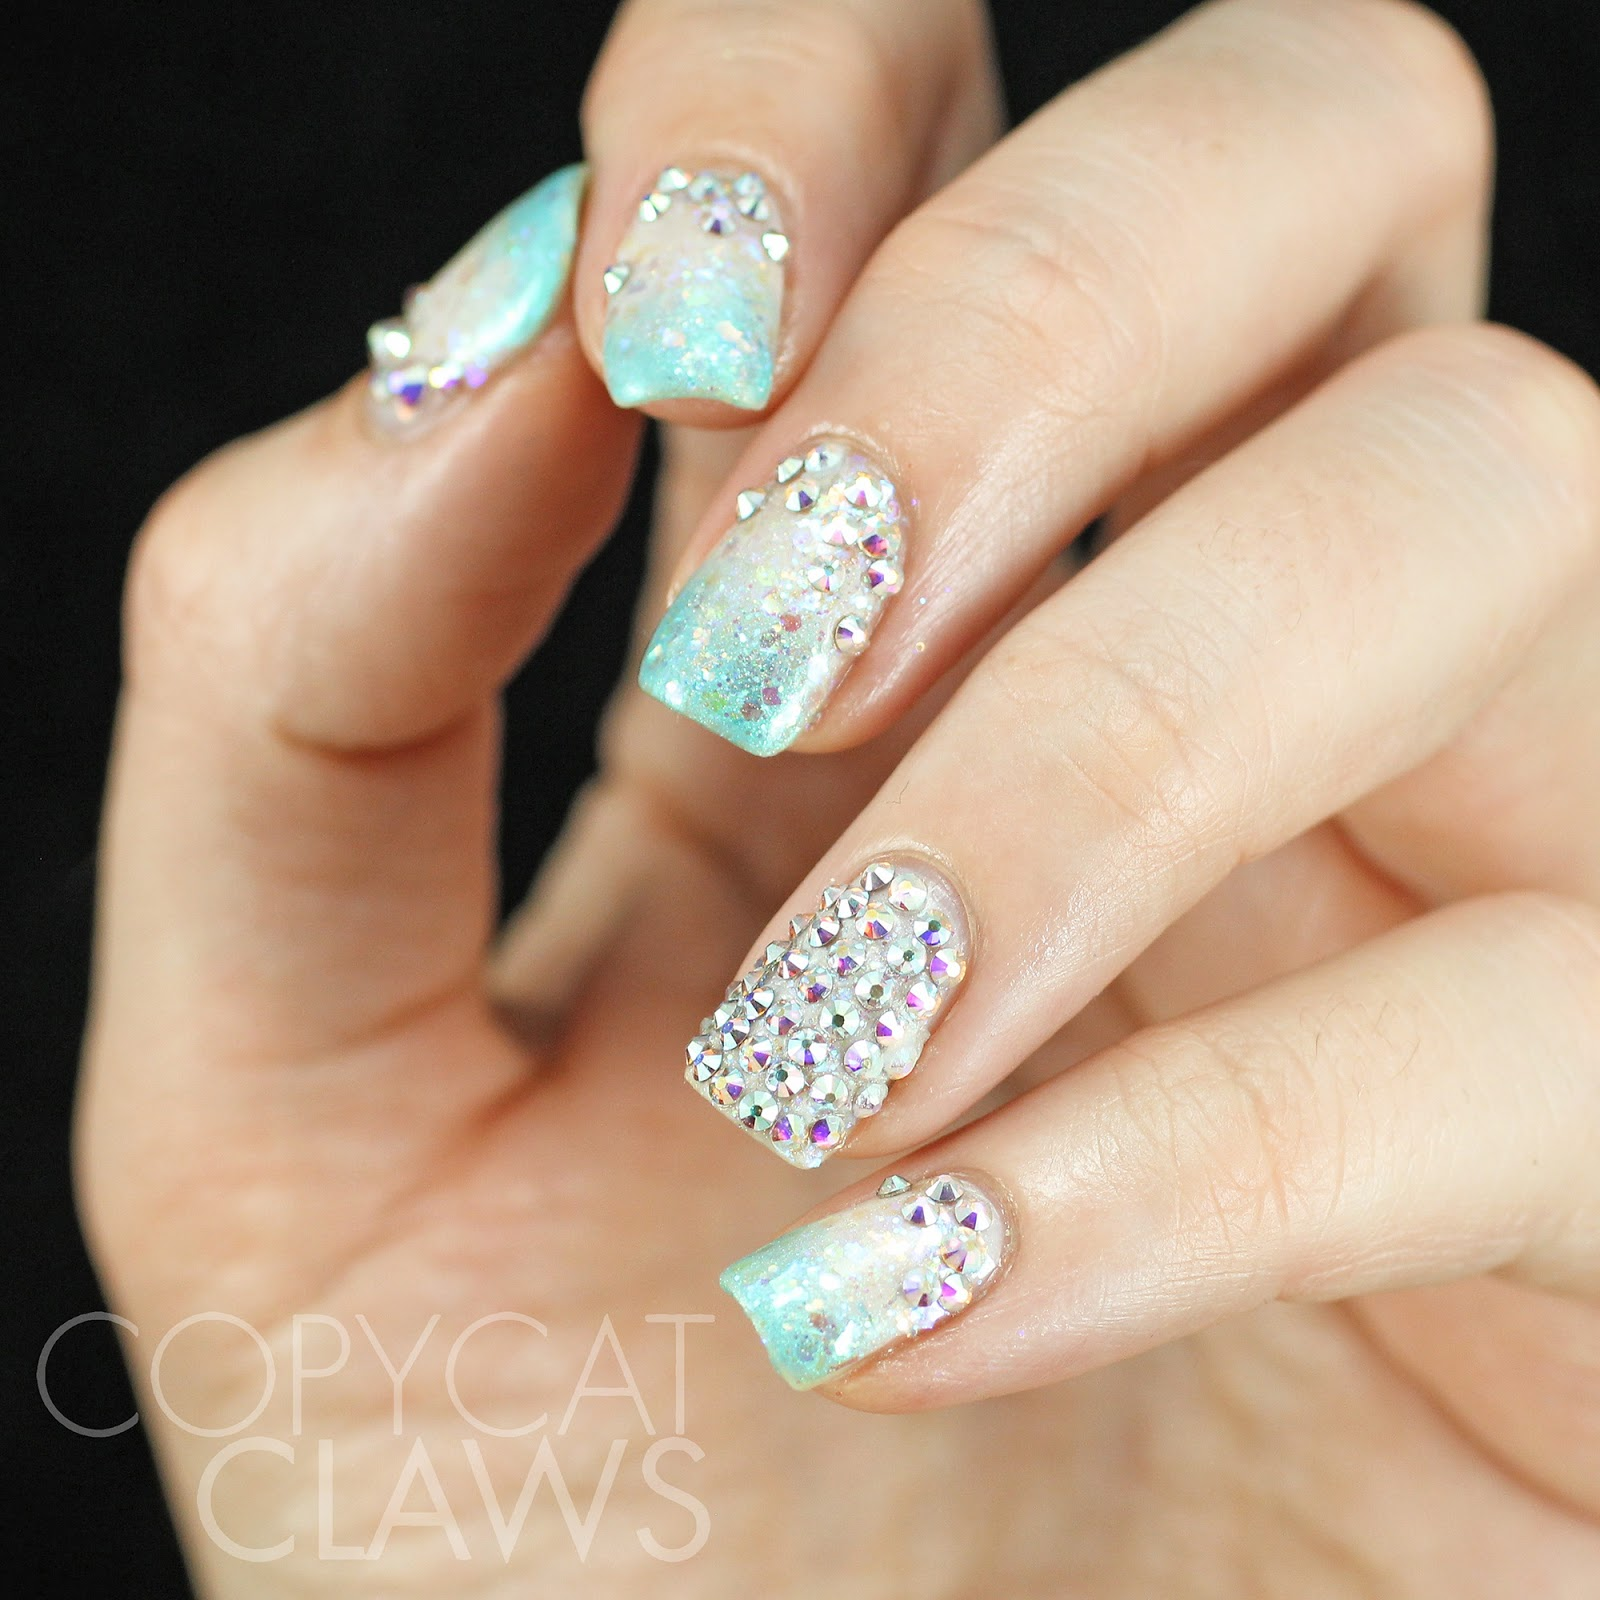 Copycat Claws: Swarovski Crystal Nails - Inspired by Pinterest